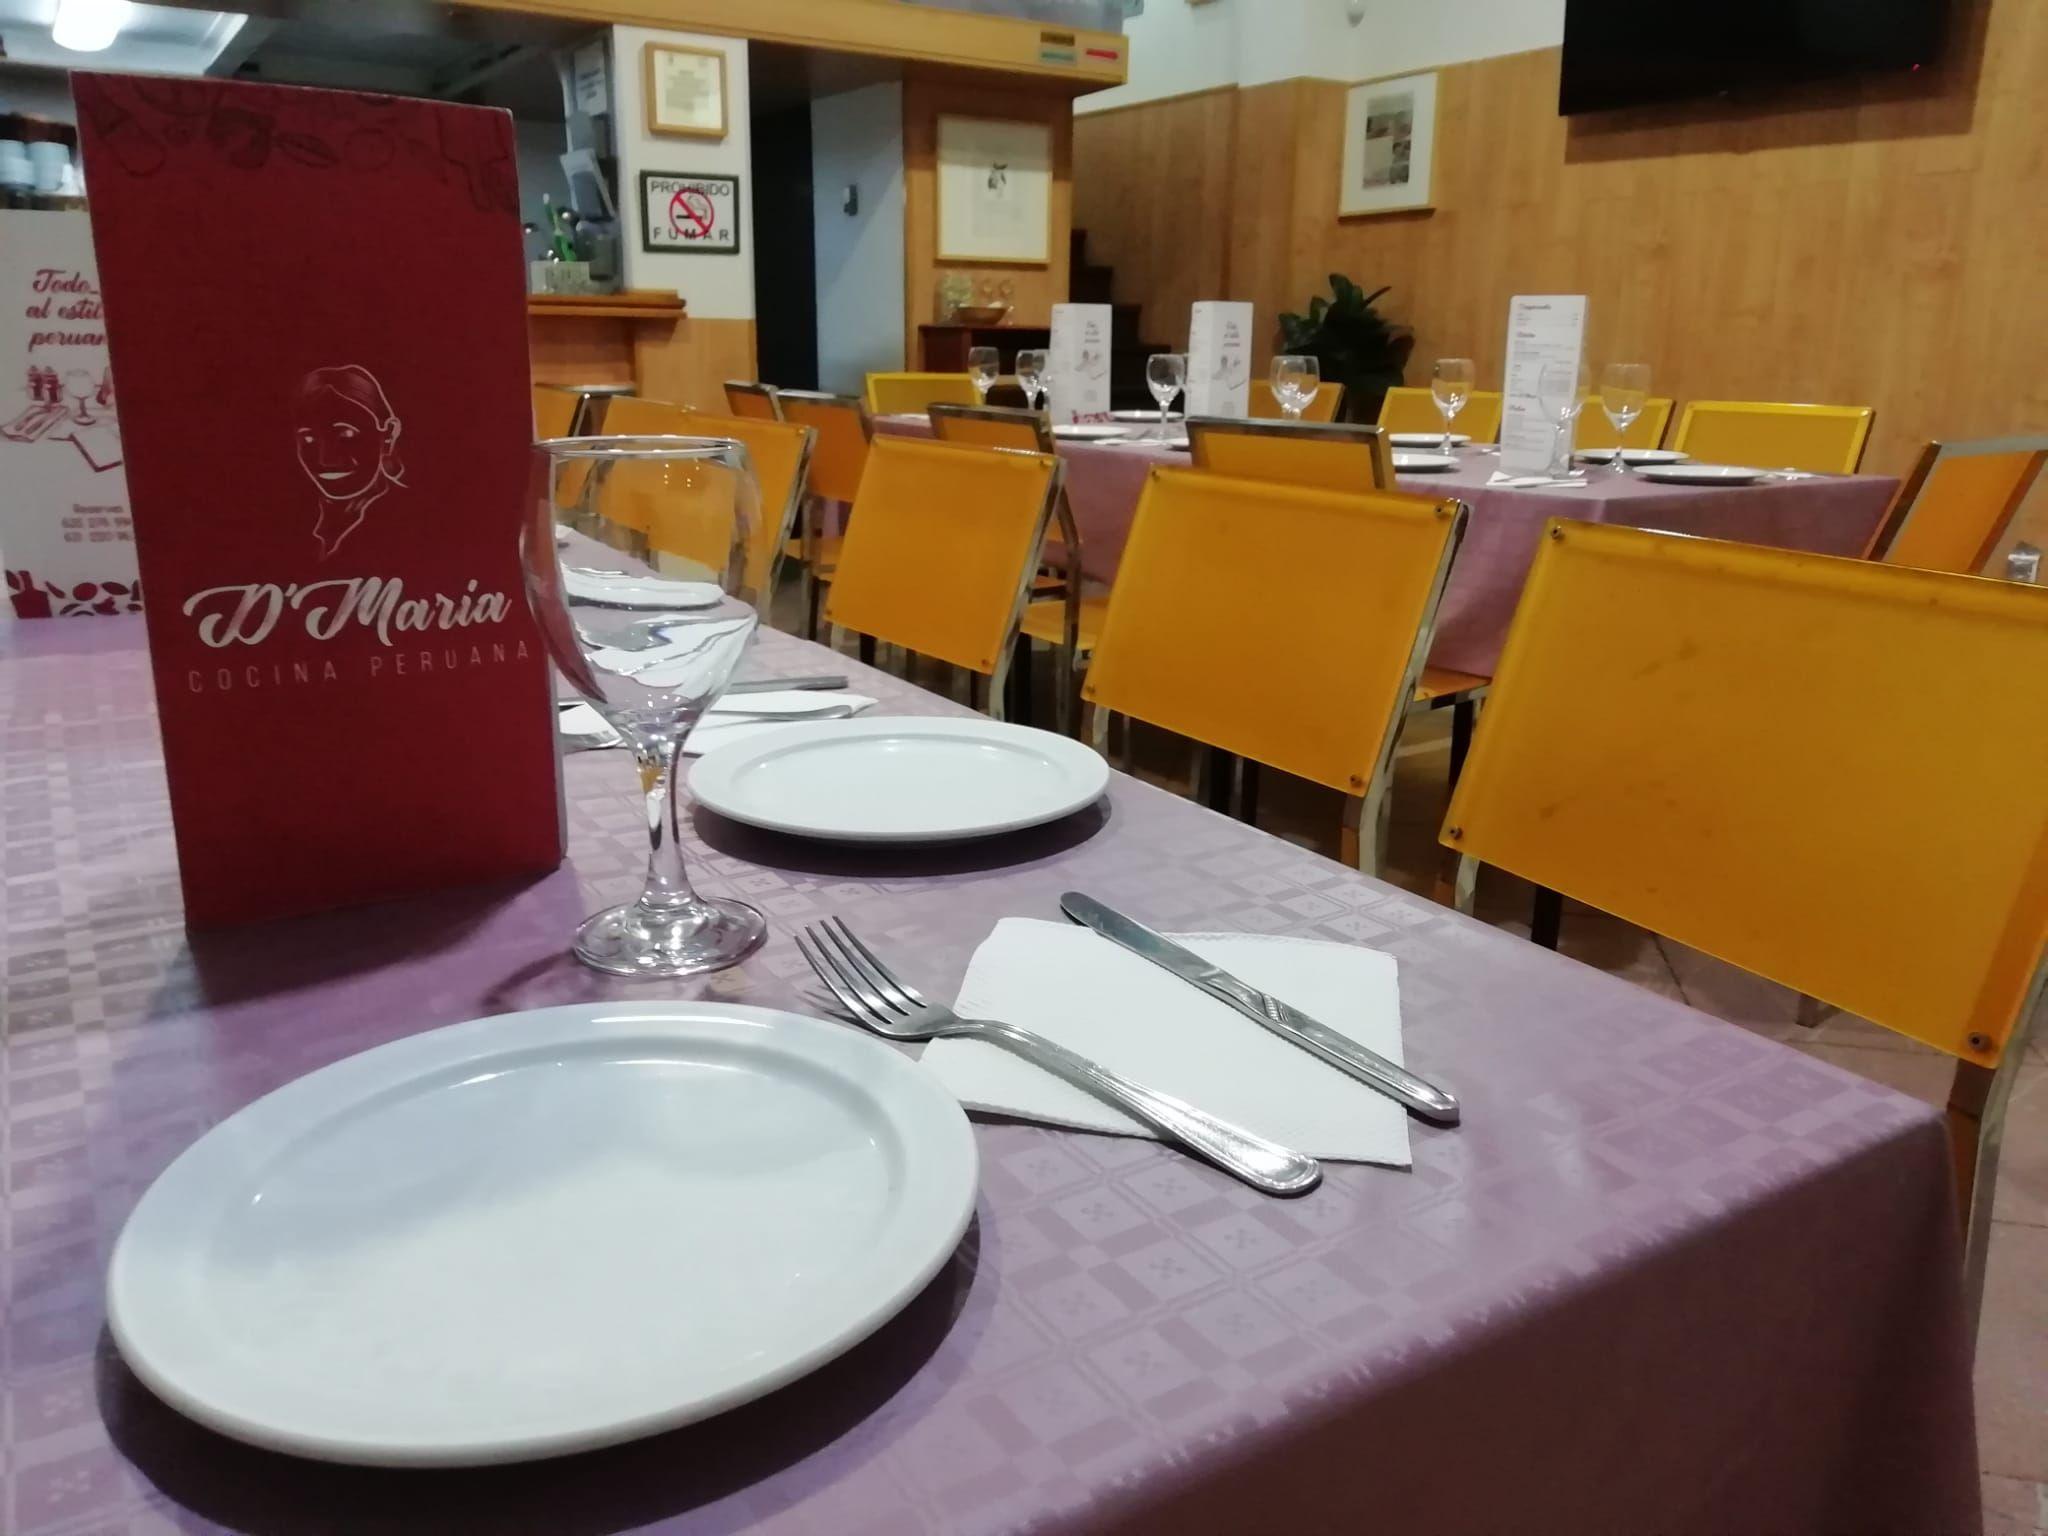 Foto 116 de Cocina peruana en  | TIKA MARIYA